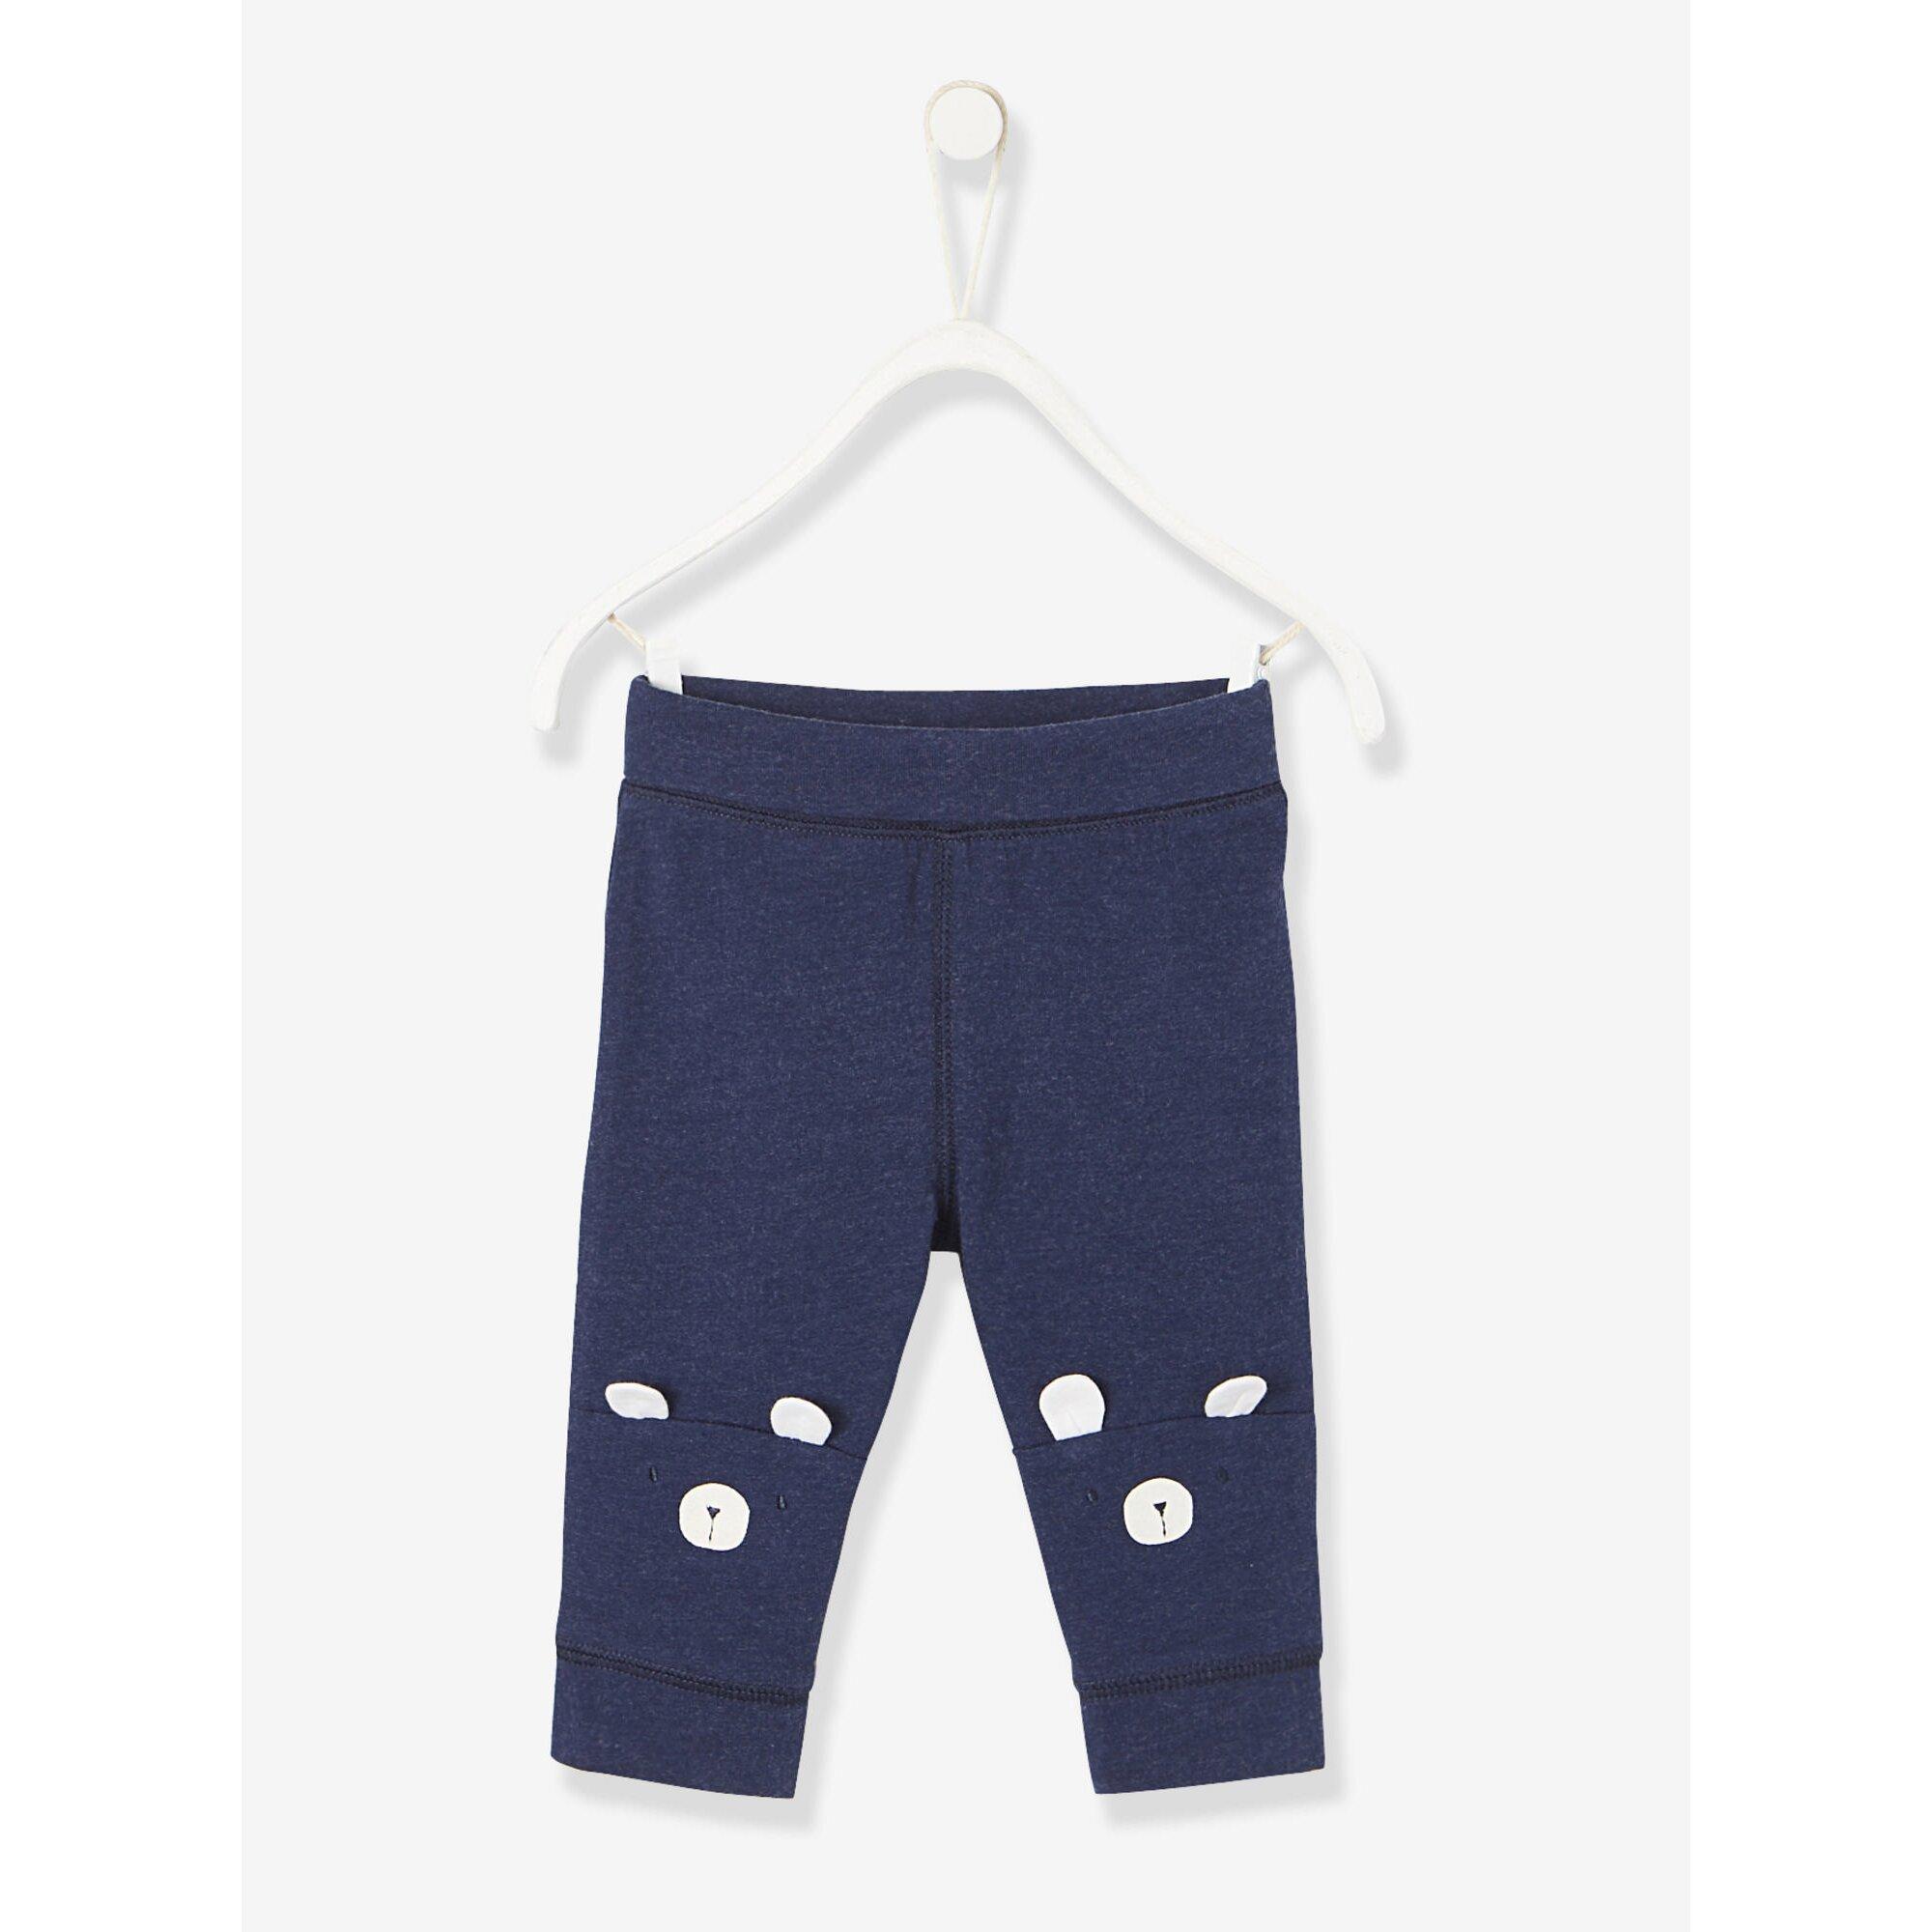 vertbaudet-set-aus-shirt-und-leggings-fur-babys